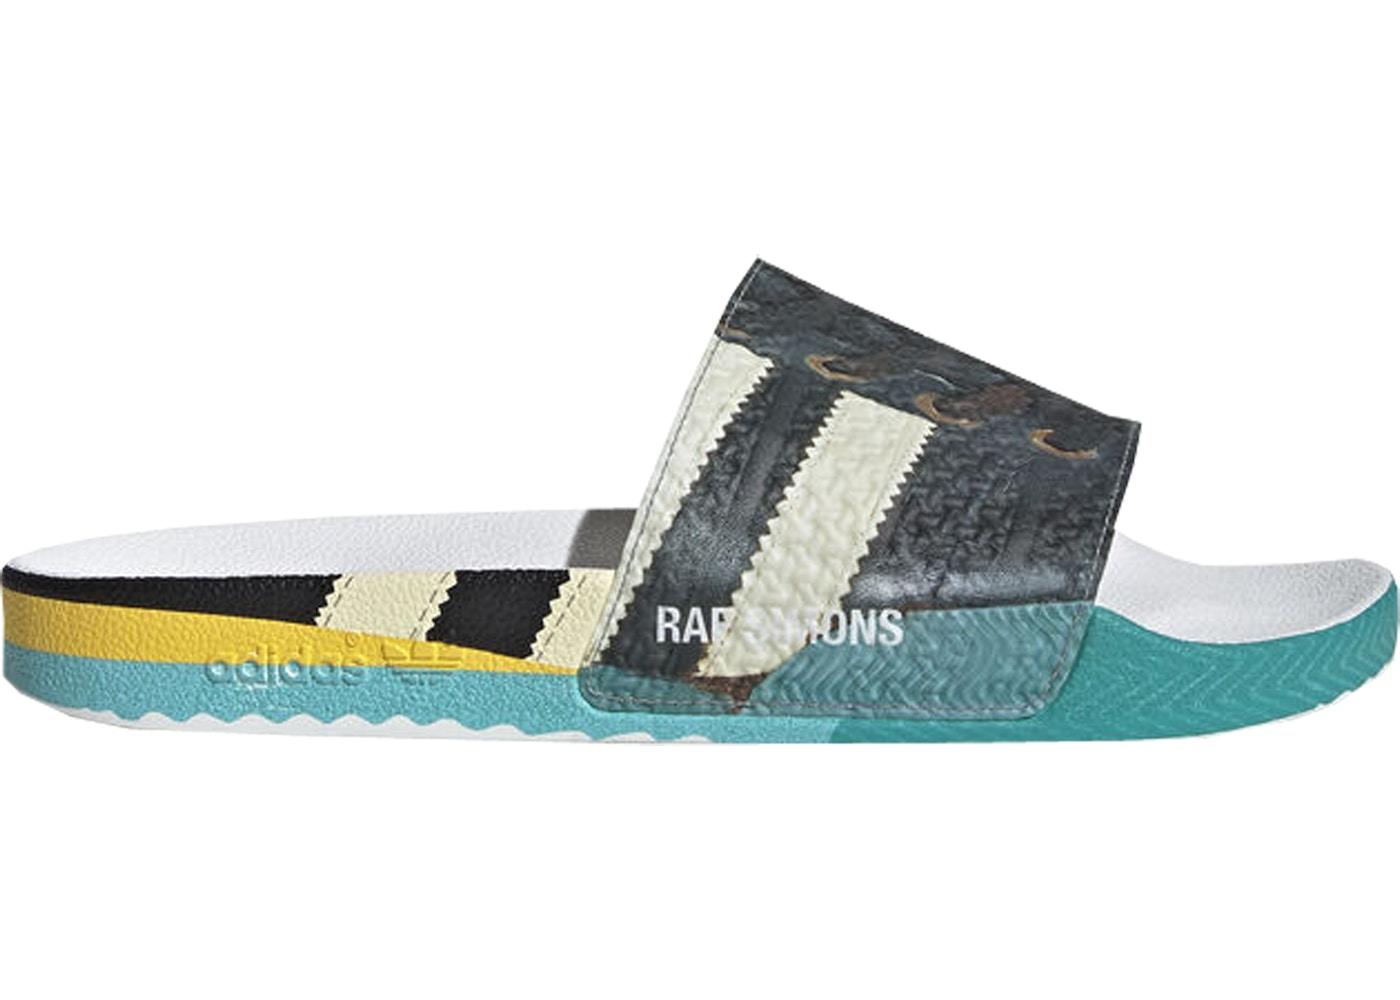 5e8f339cff0f0 adidas Samba Adilette Raf Simons - EE7959